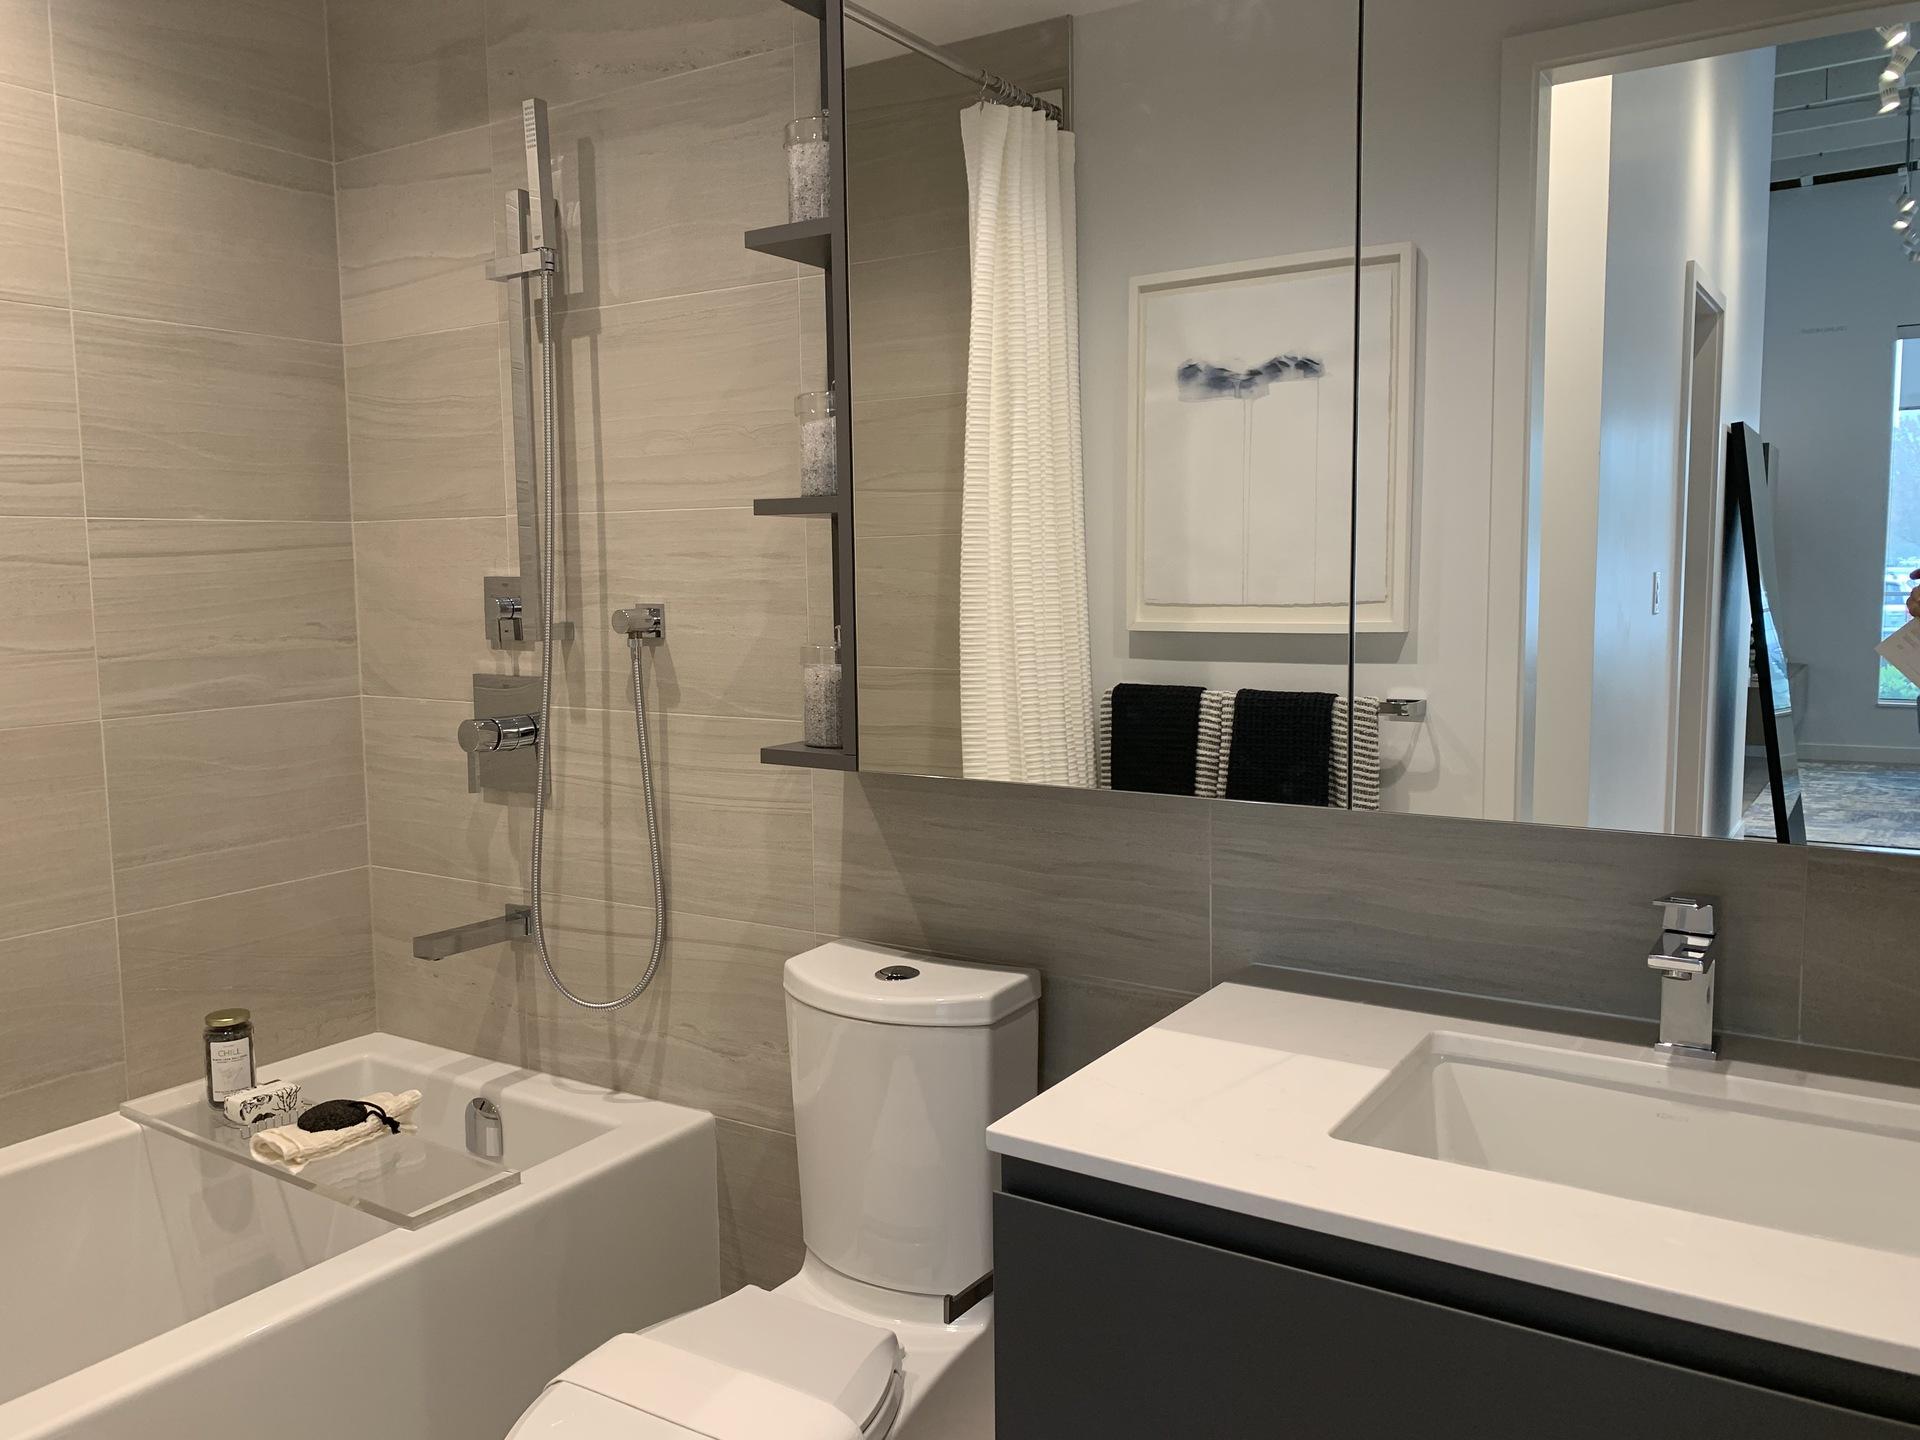 RC bathroom in dark colour scheme at RC at CF Richmond Centre (6331 Number 3 Road, Brighouse, Richmond)